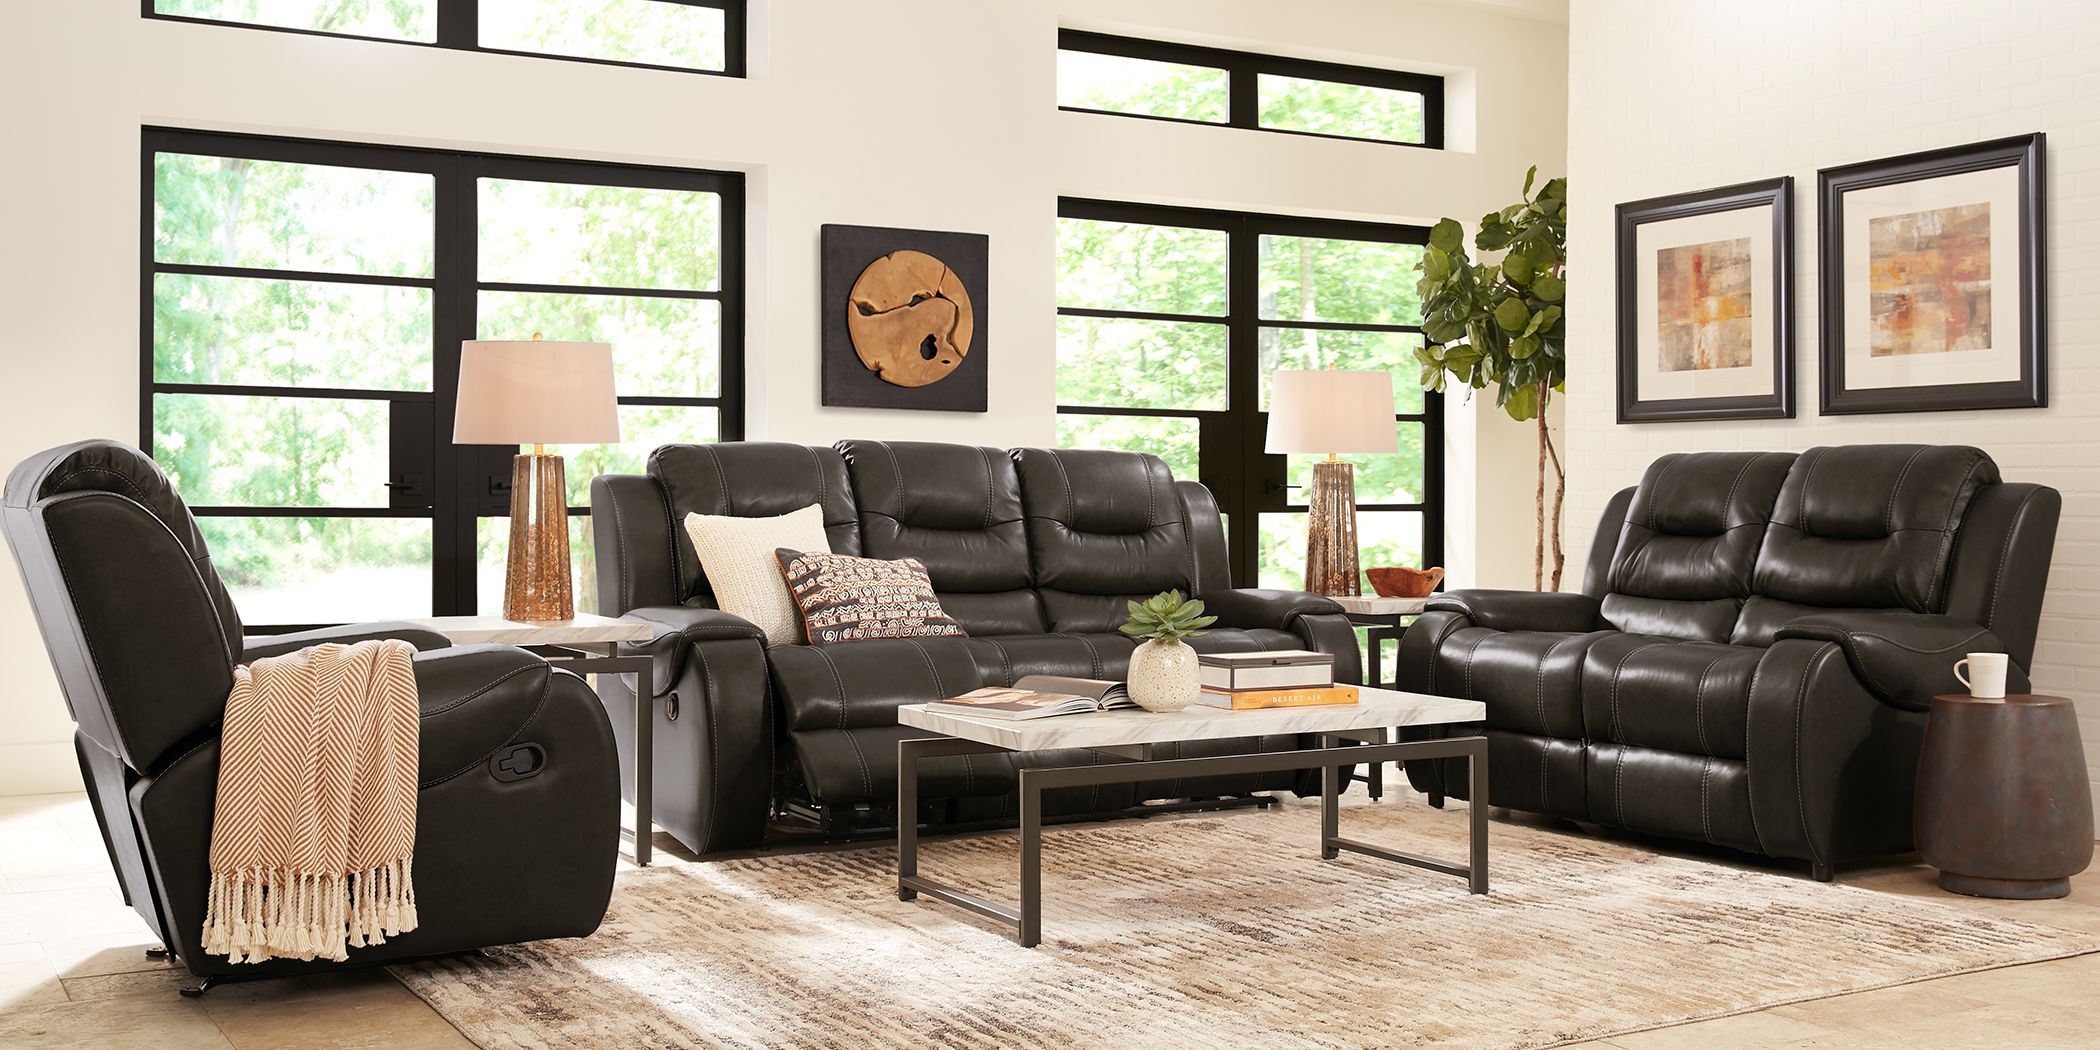 Black Reclining Sofas